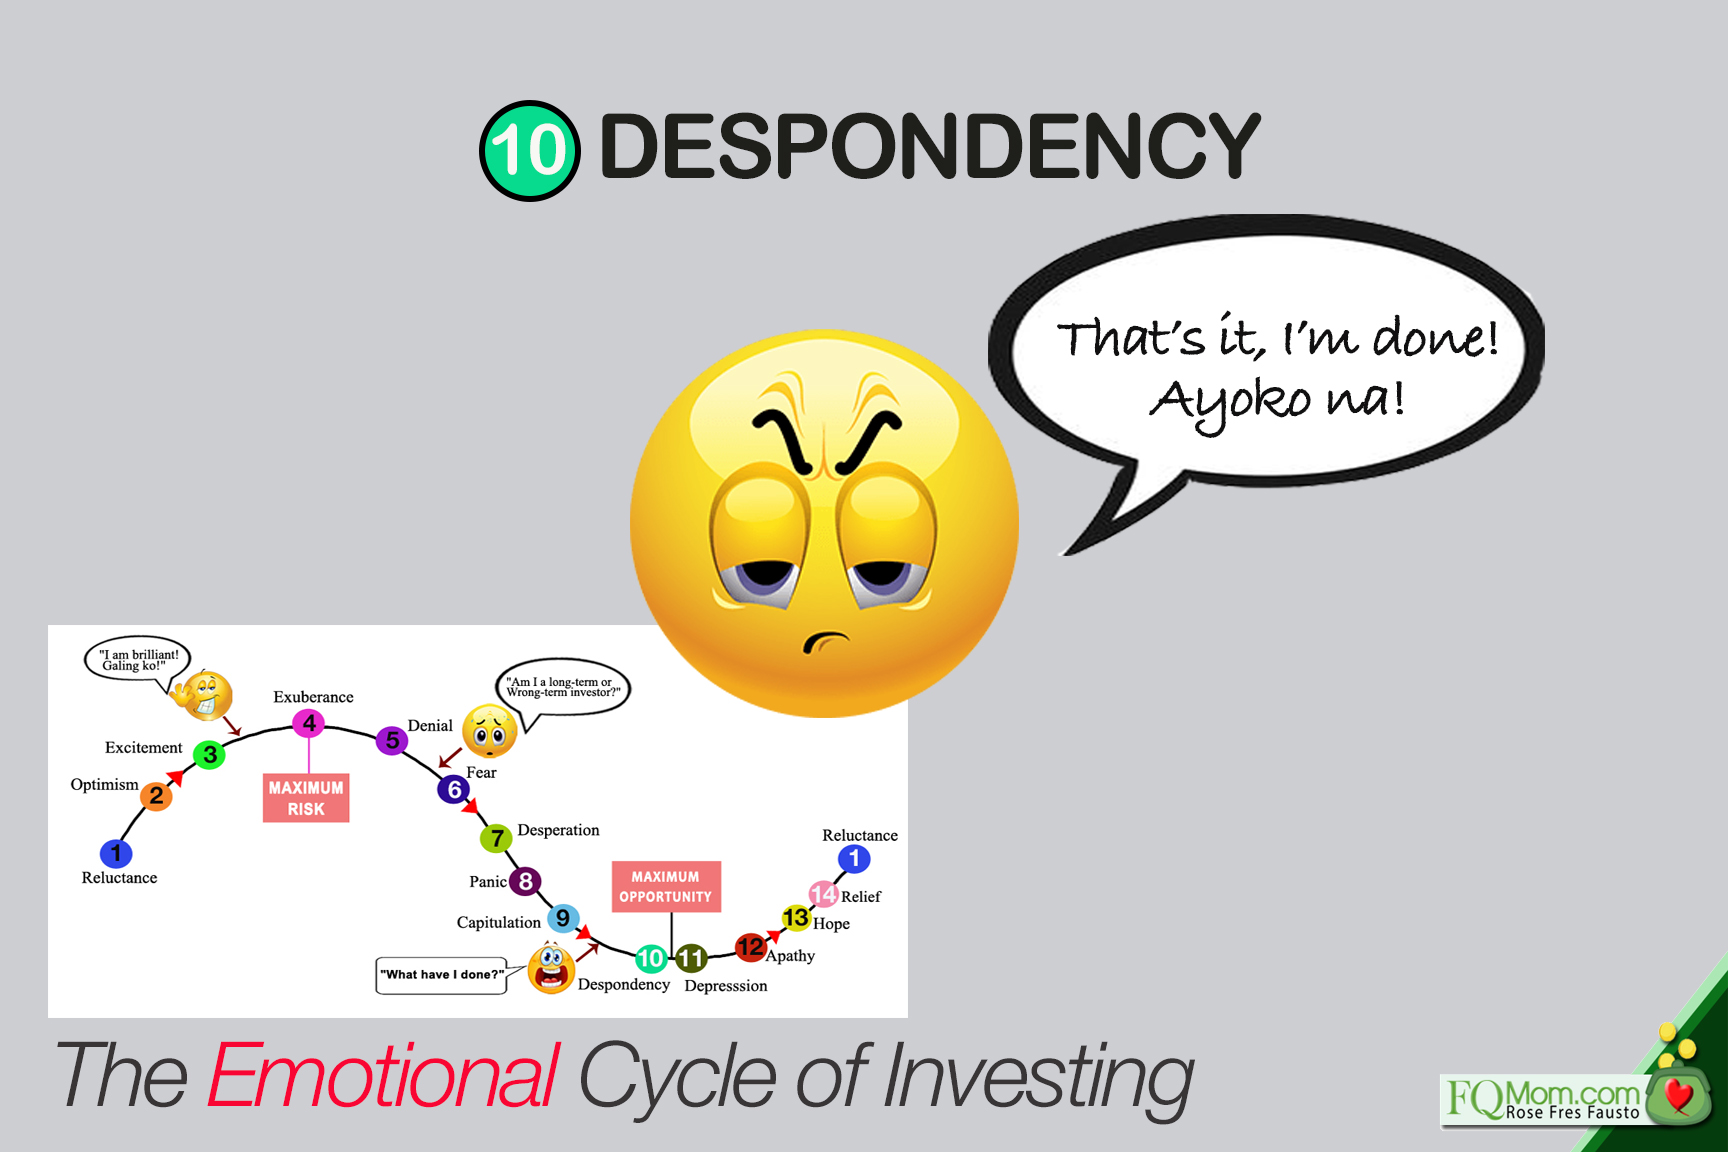 10-despondency